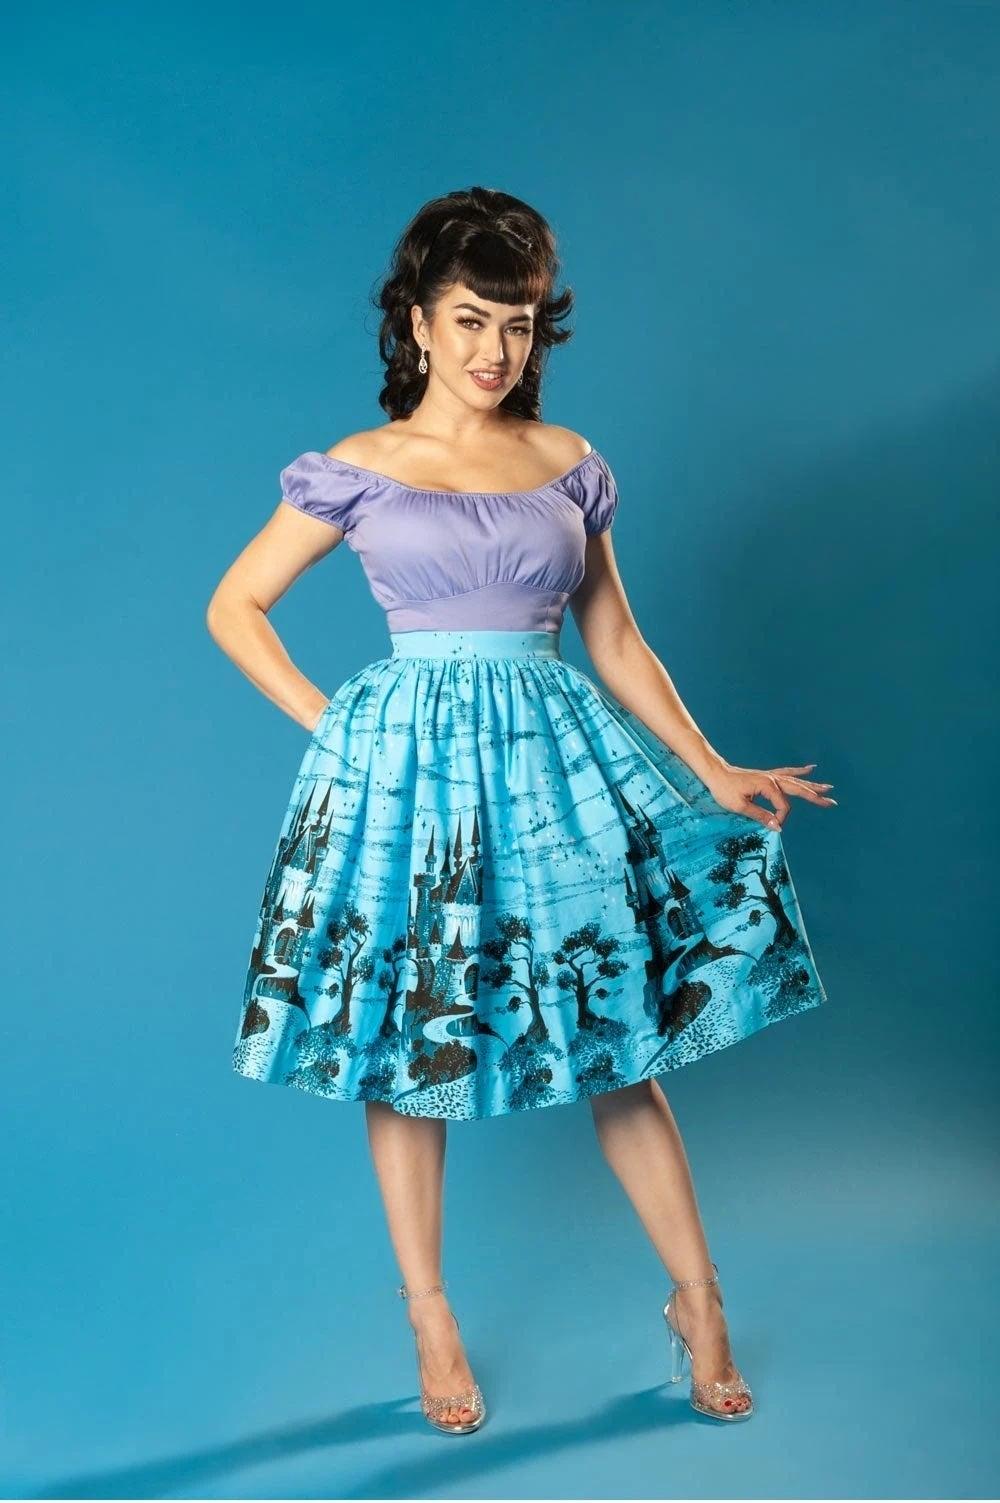 Pinup Clothing Blue Skirt